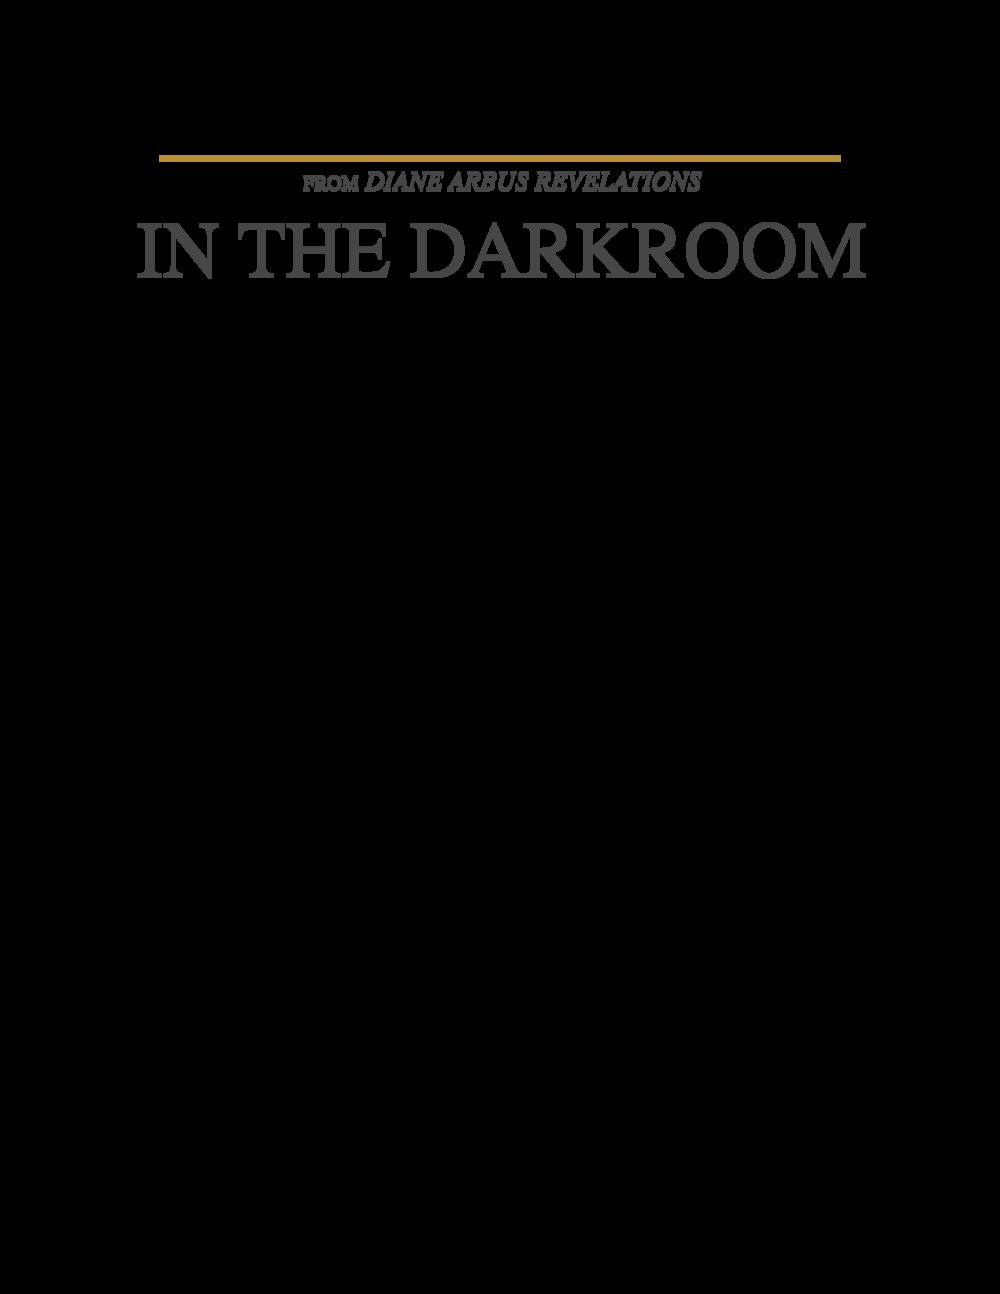 In the Darkroom1.png